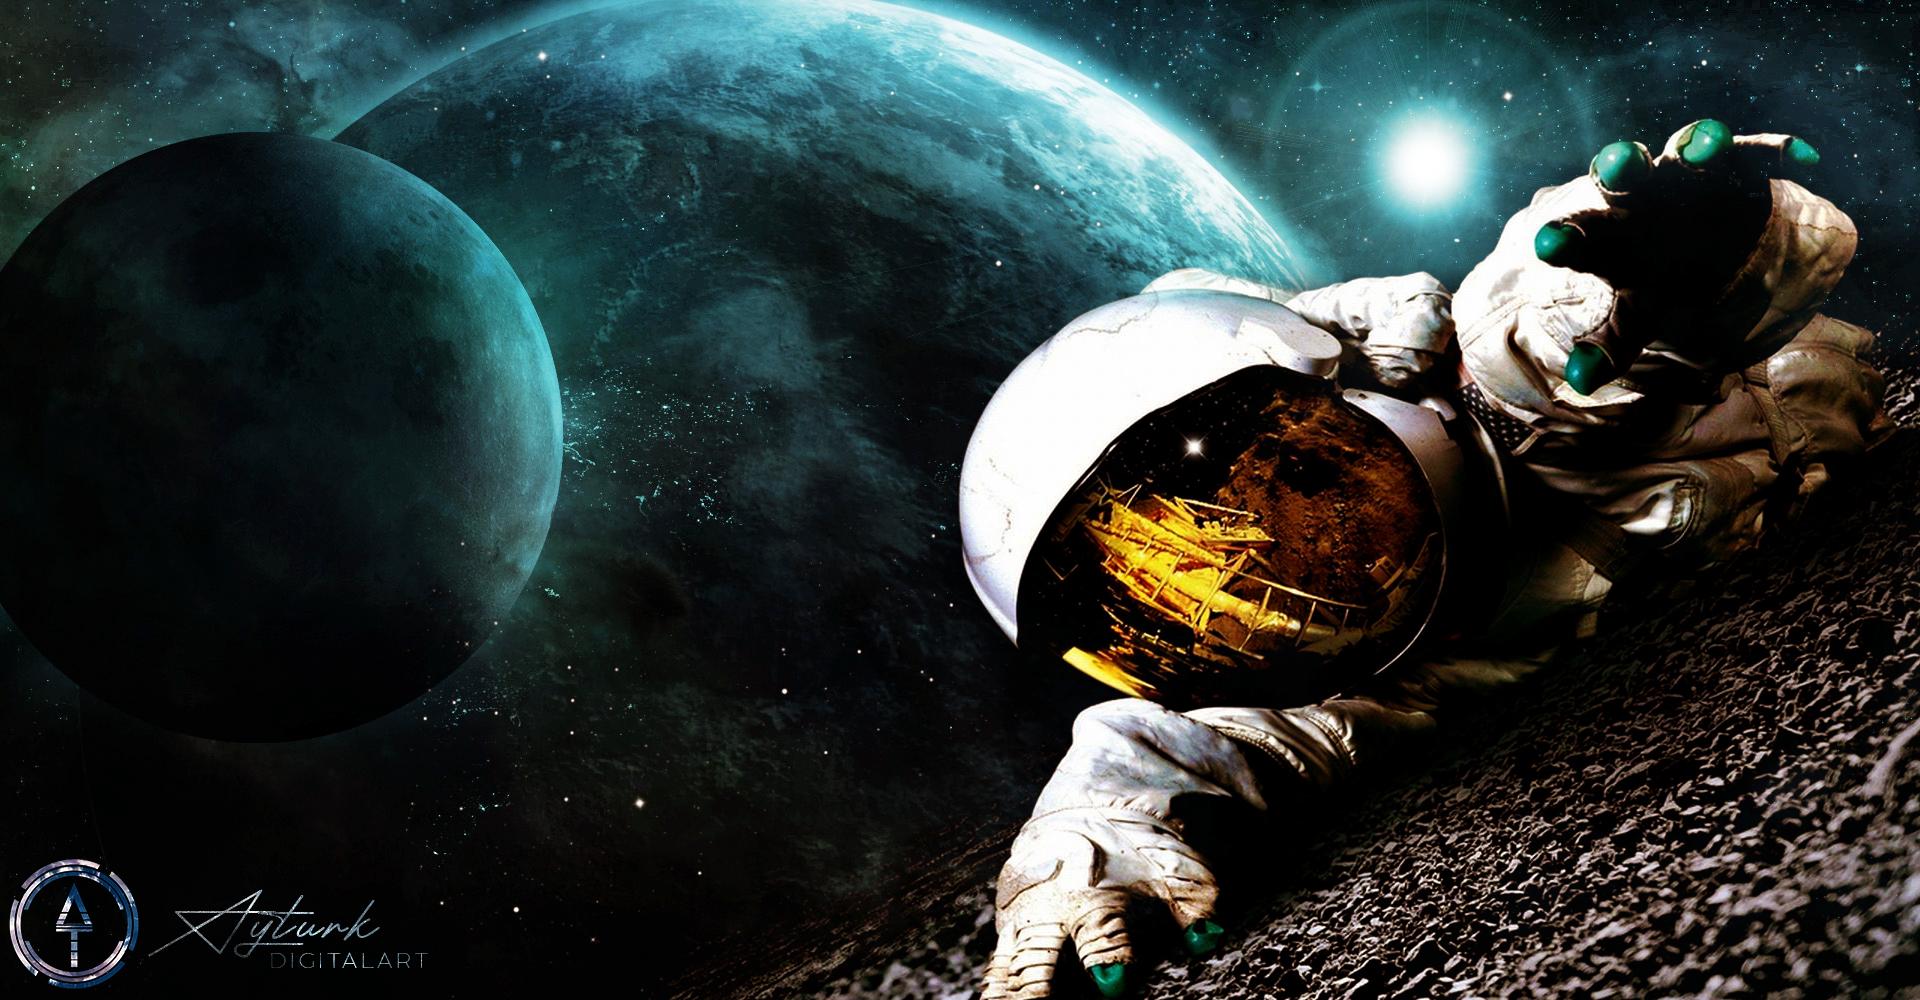 Wallpaper : space art, TolgaAyt rk, NASA, spacescapes